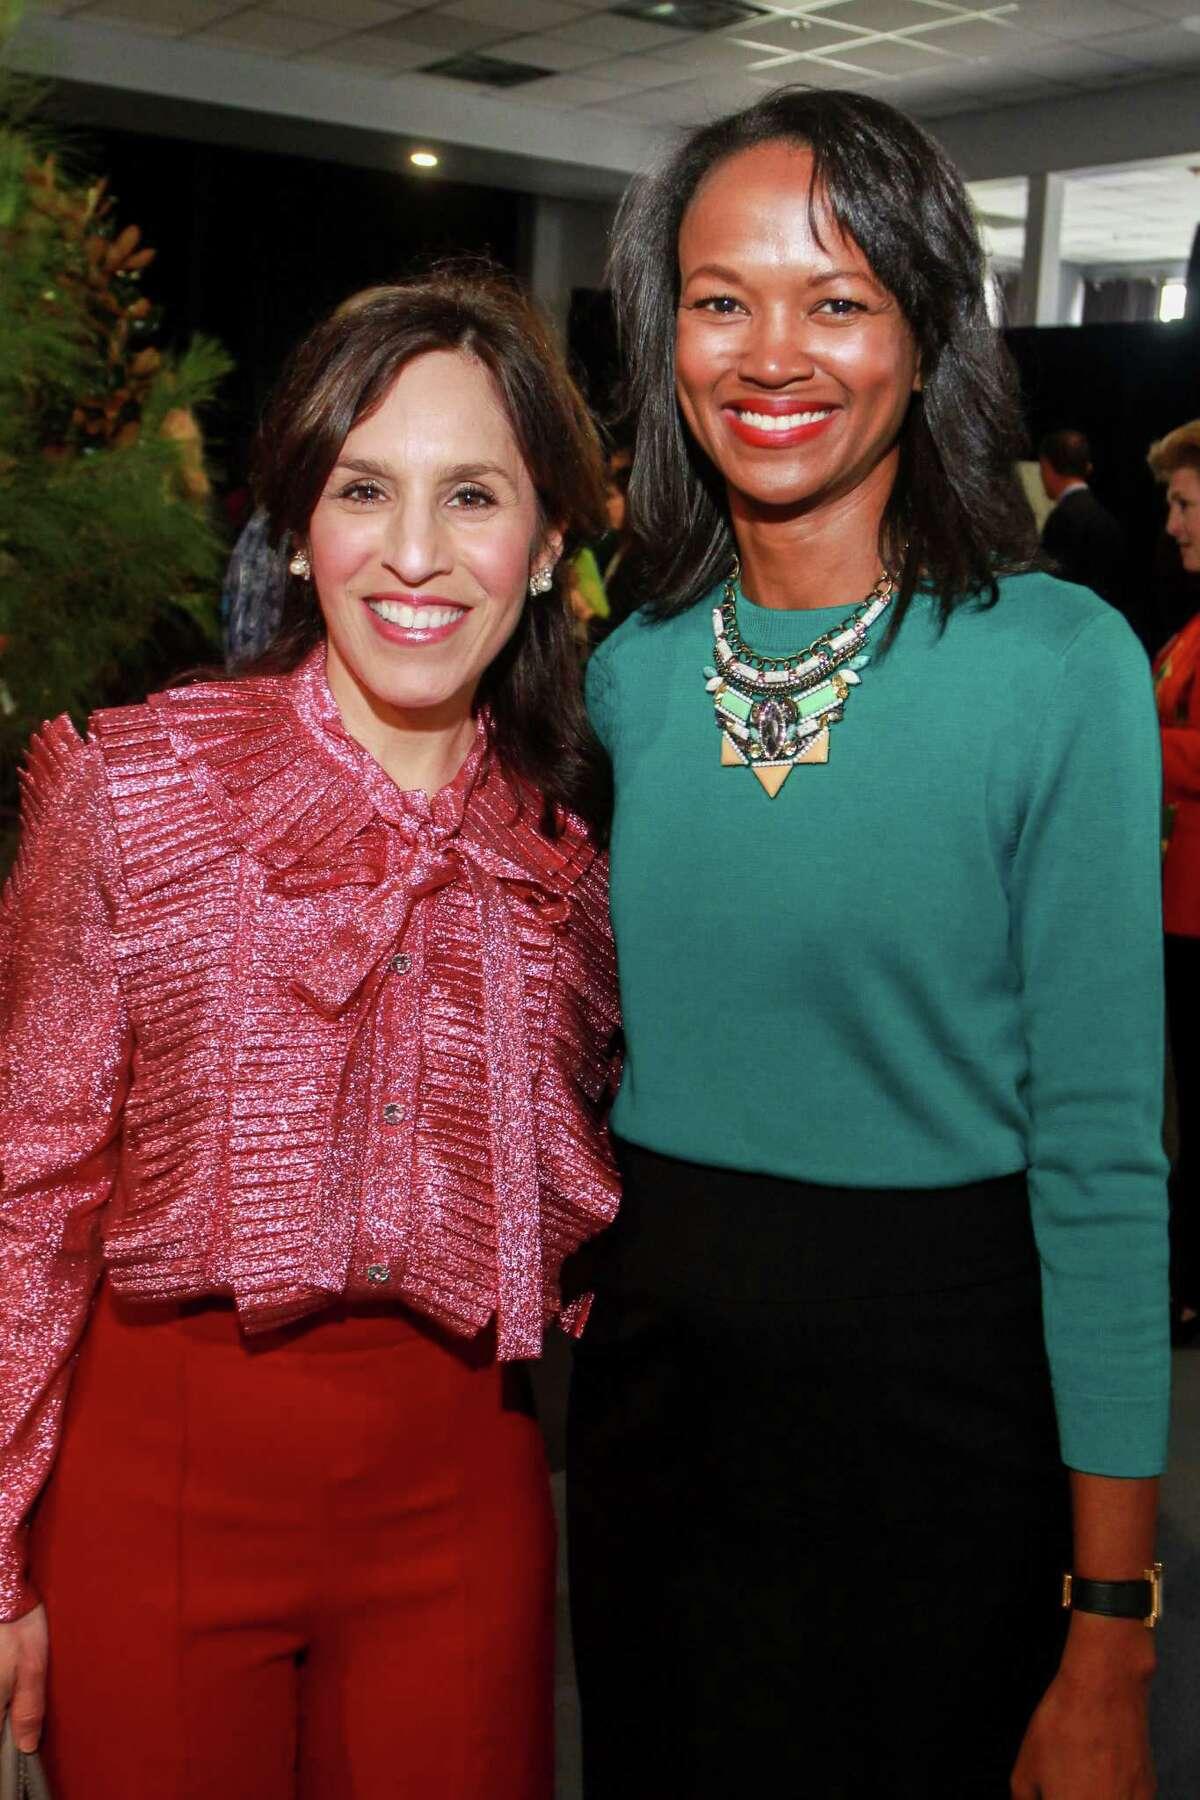 Rosa Maria Villagomez, left, and Precious Owodunni at the Houston Parks Board's annual luncheon.